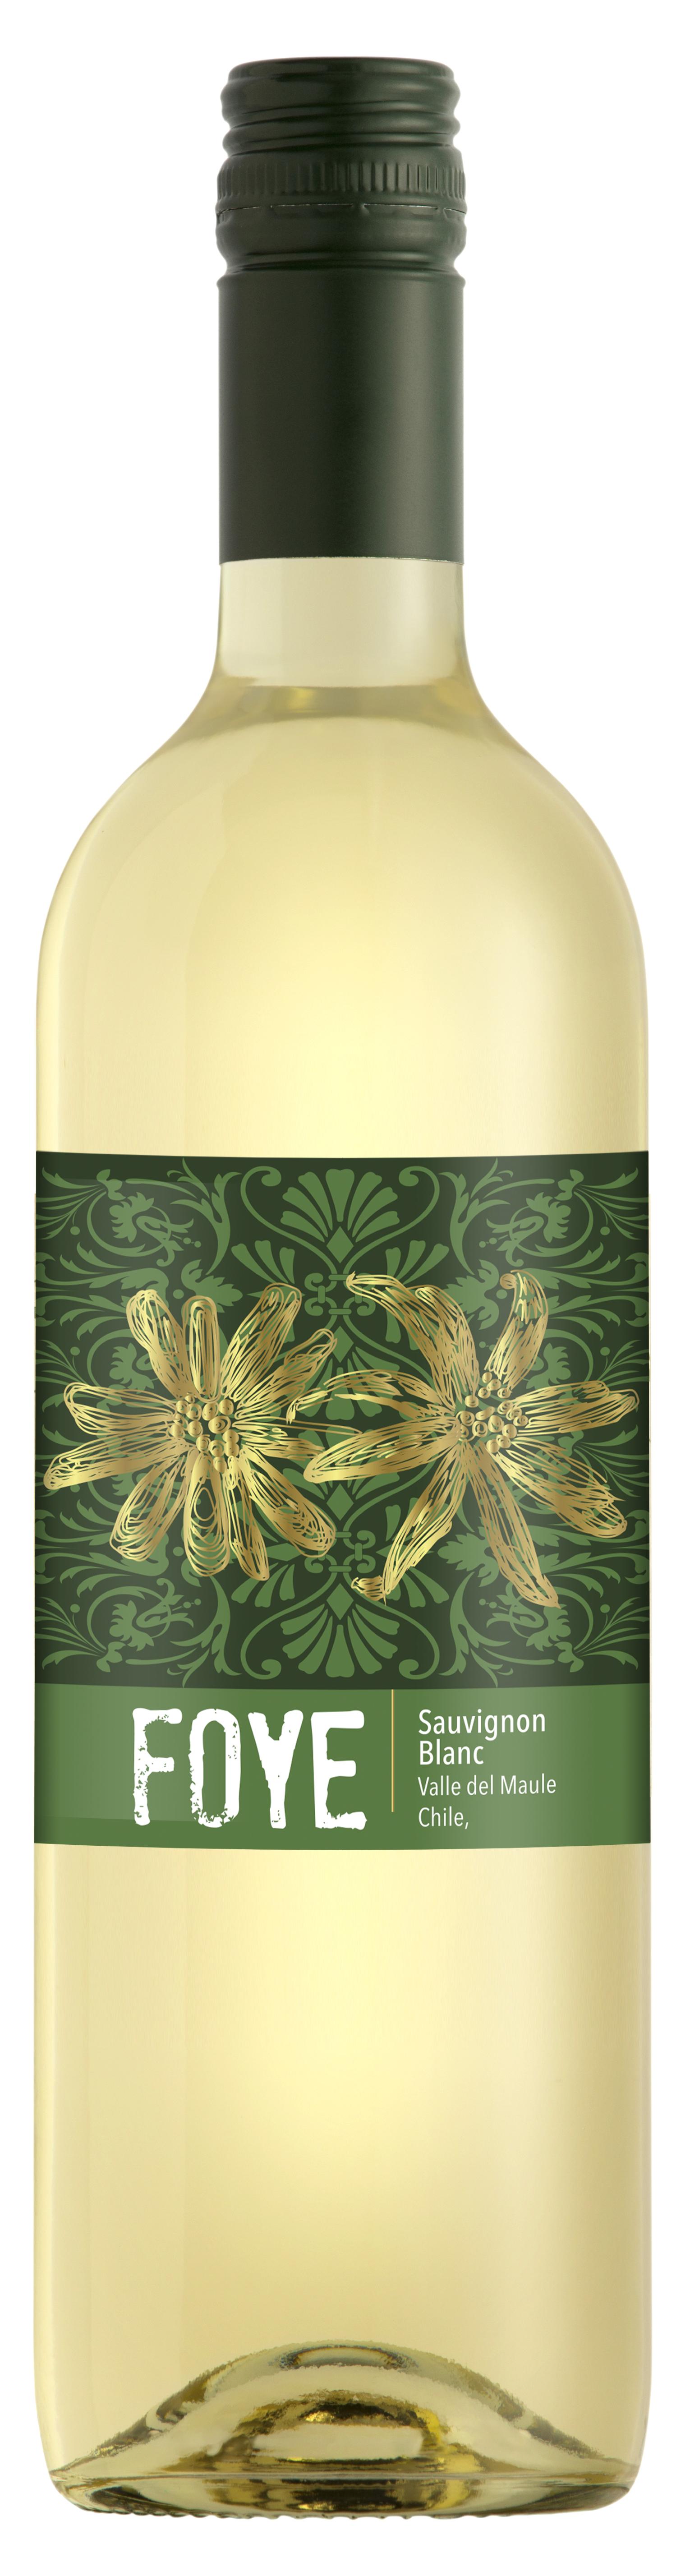 Foye Sauvignon Blanc